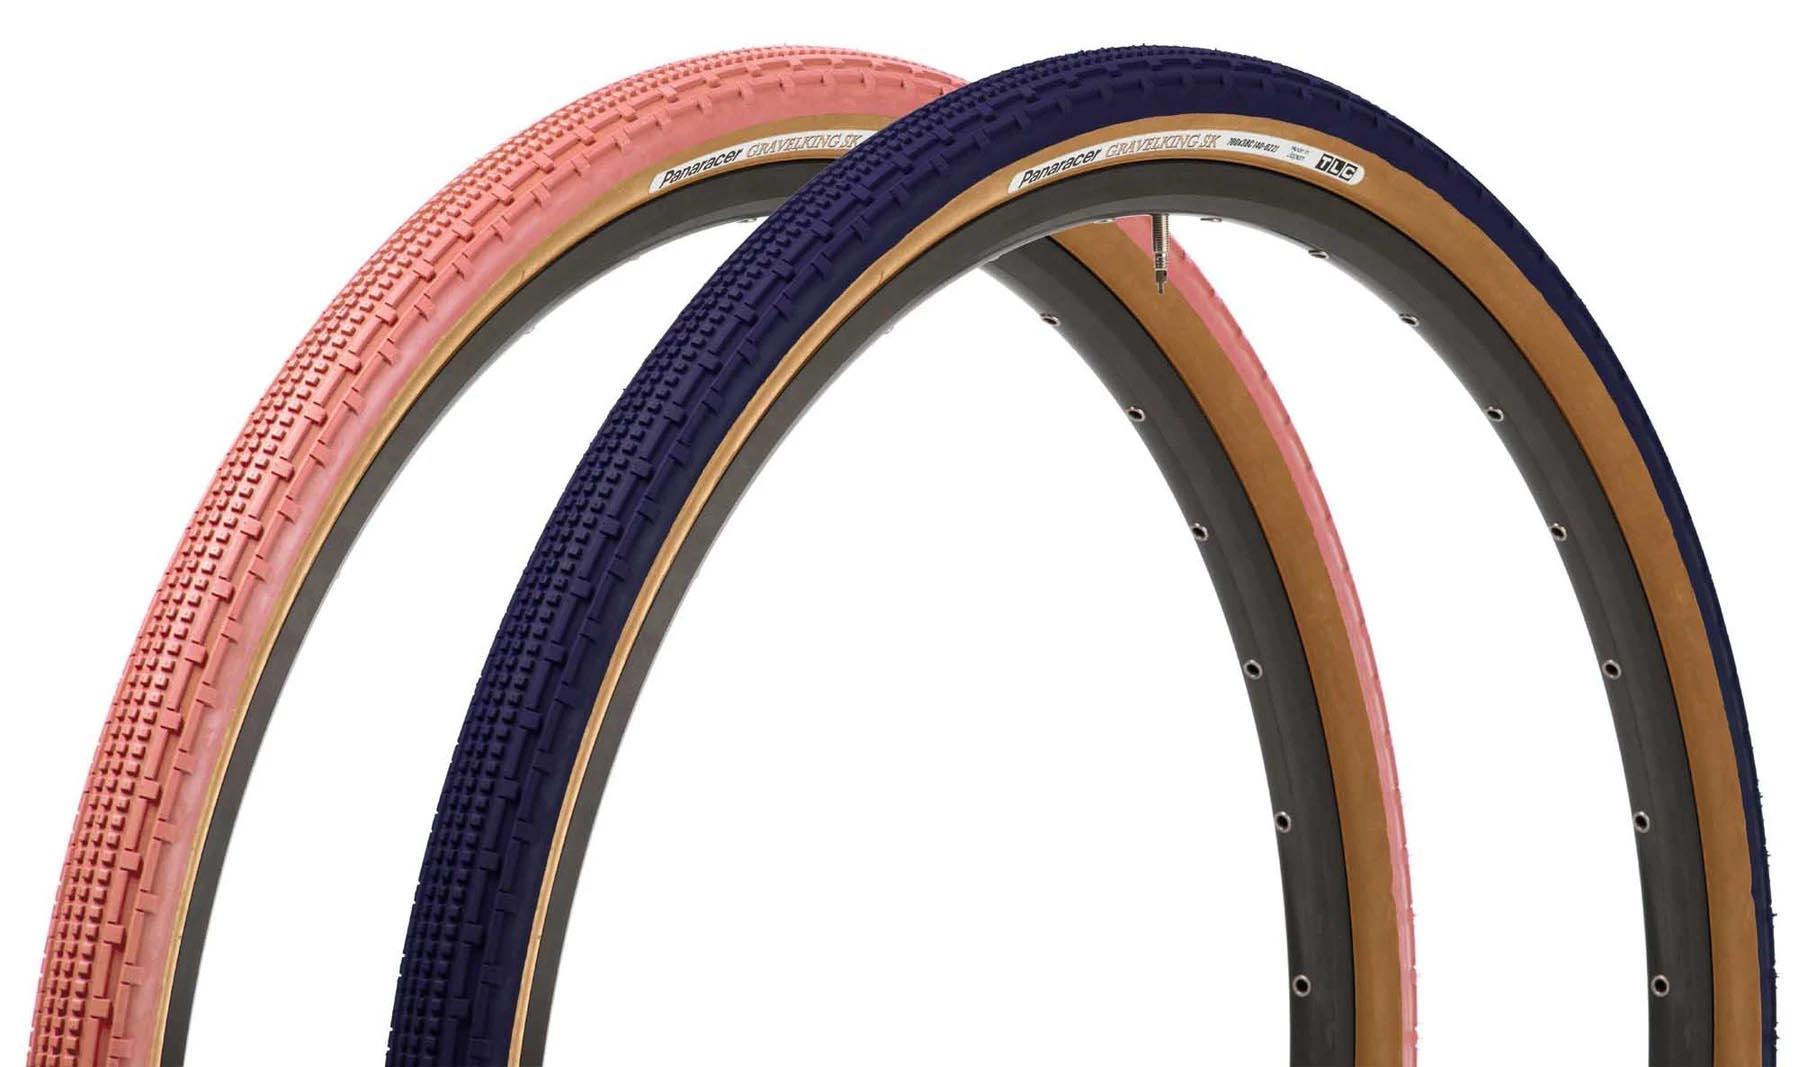 Pansy Blue & Flamingo Pink Panaracer GravelKing tires